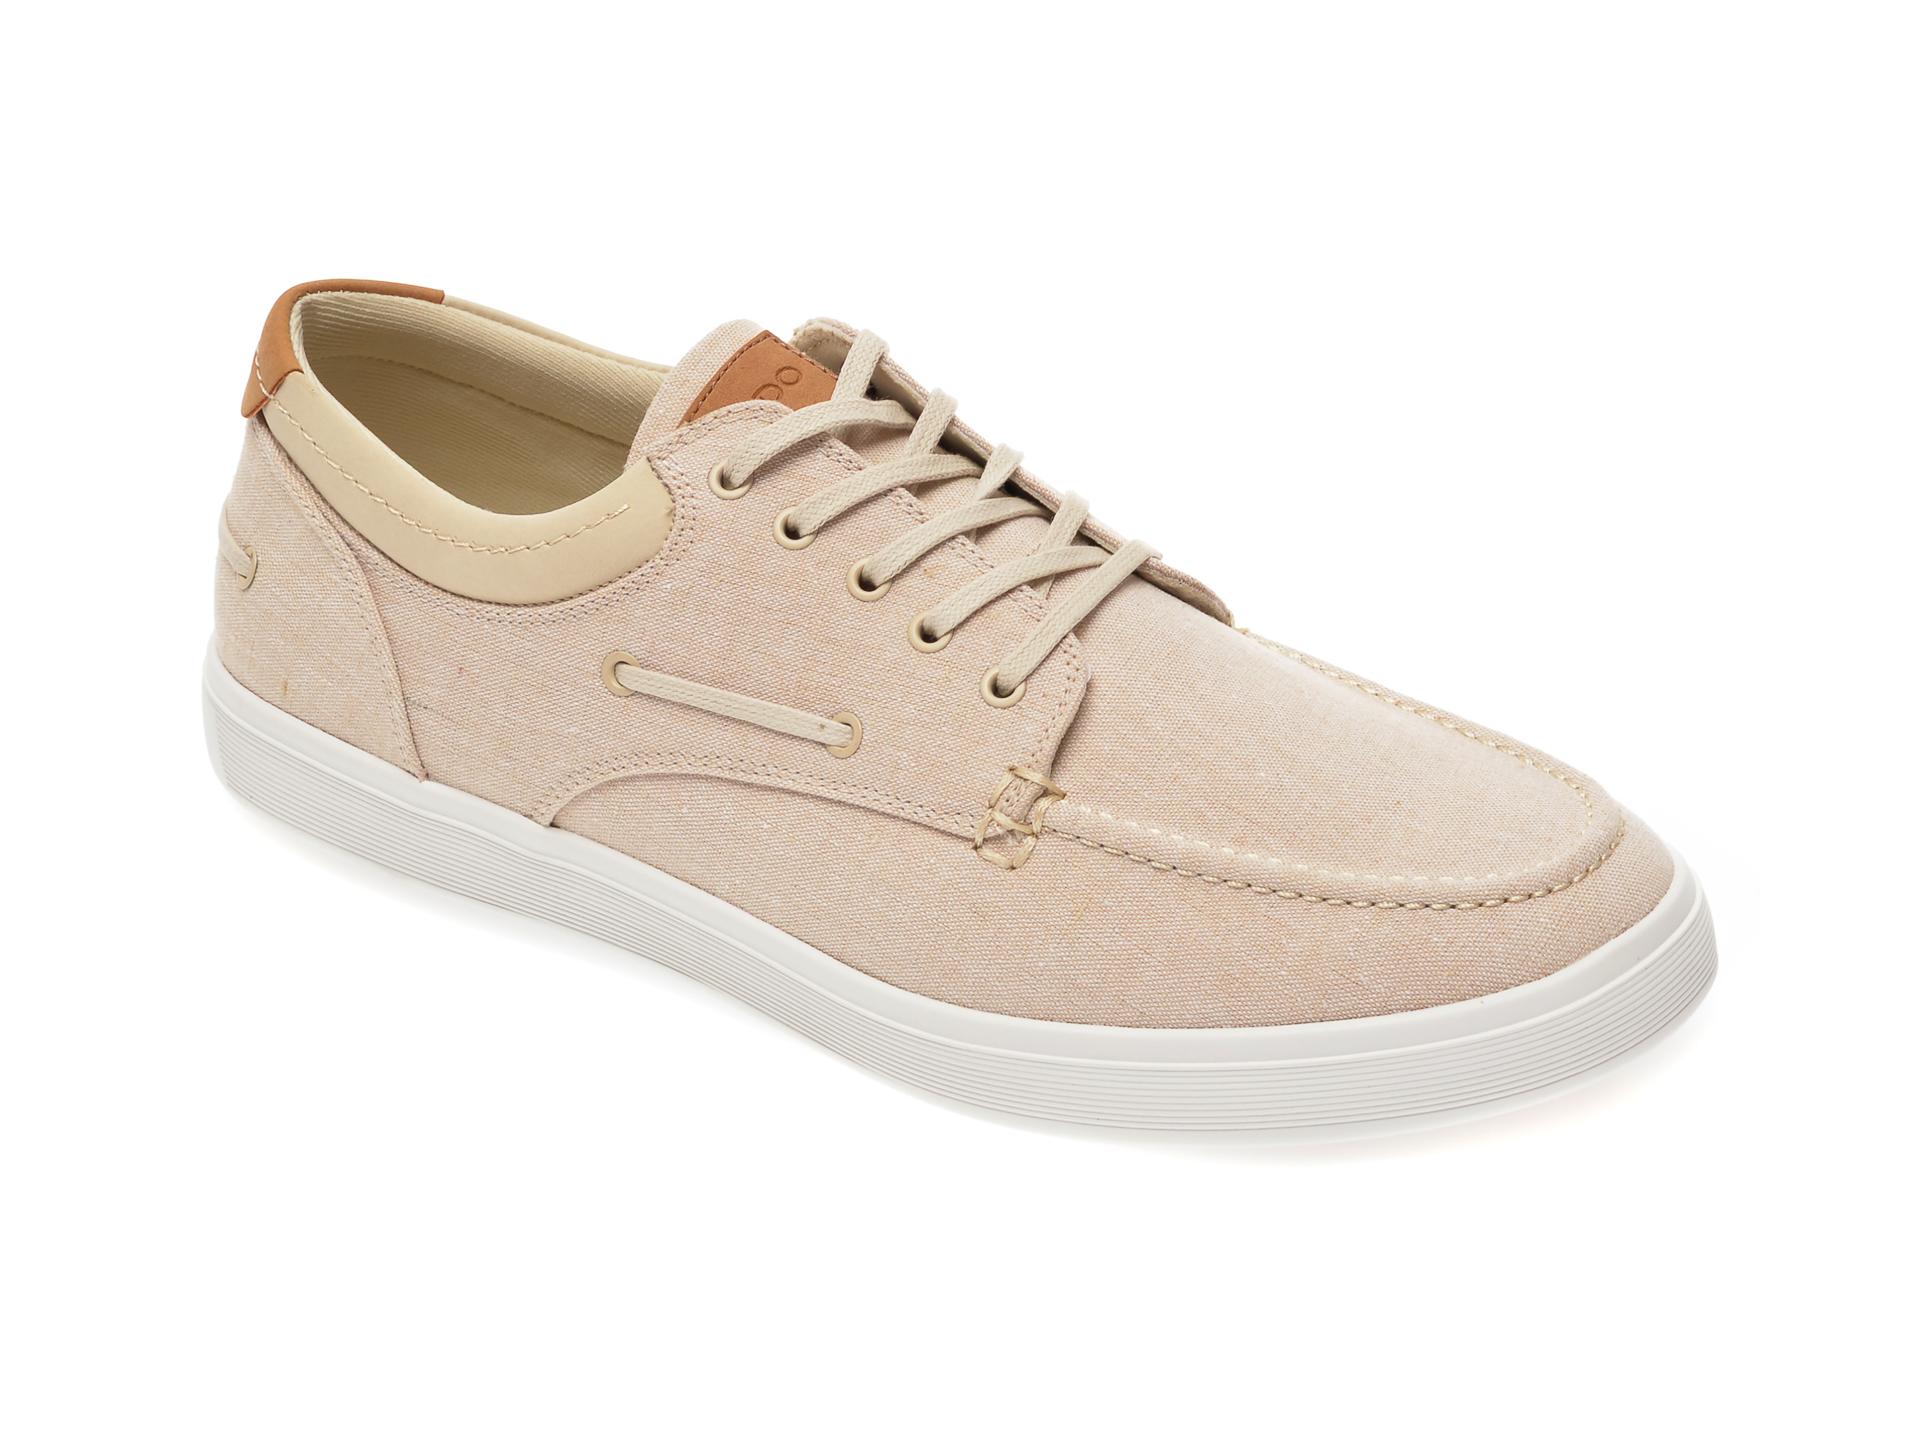 Pantofi ALDO bej, Bridleholme271, din material textil imagine